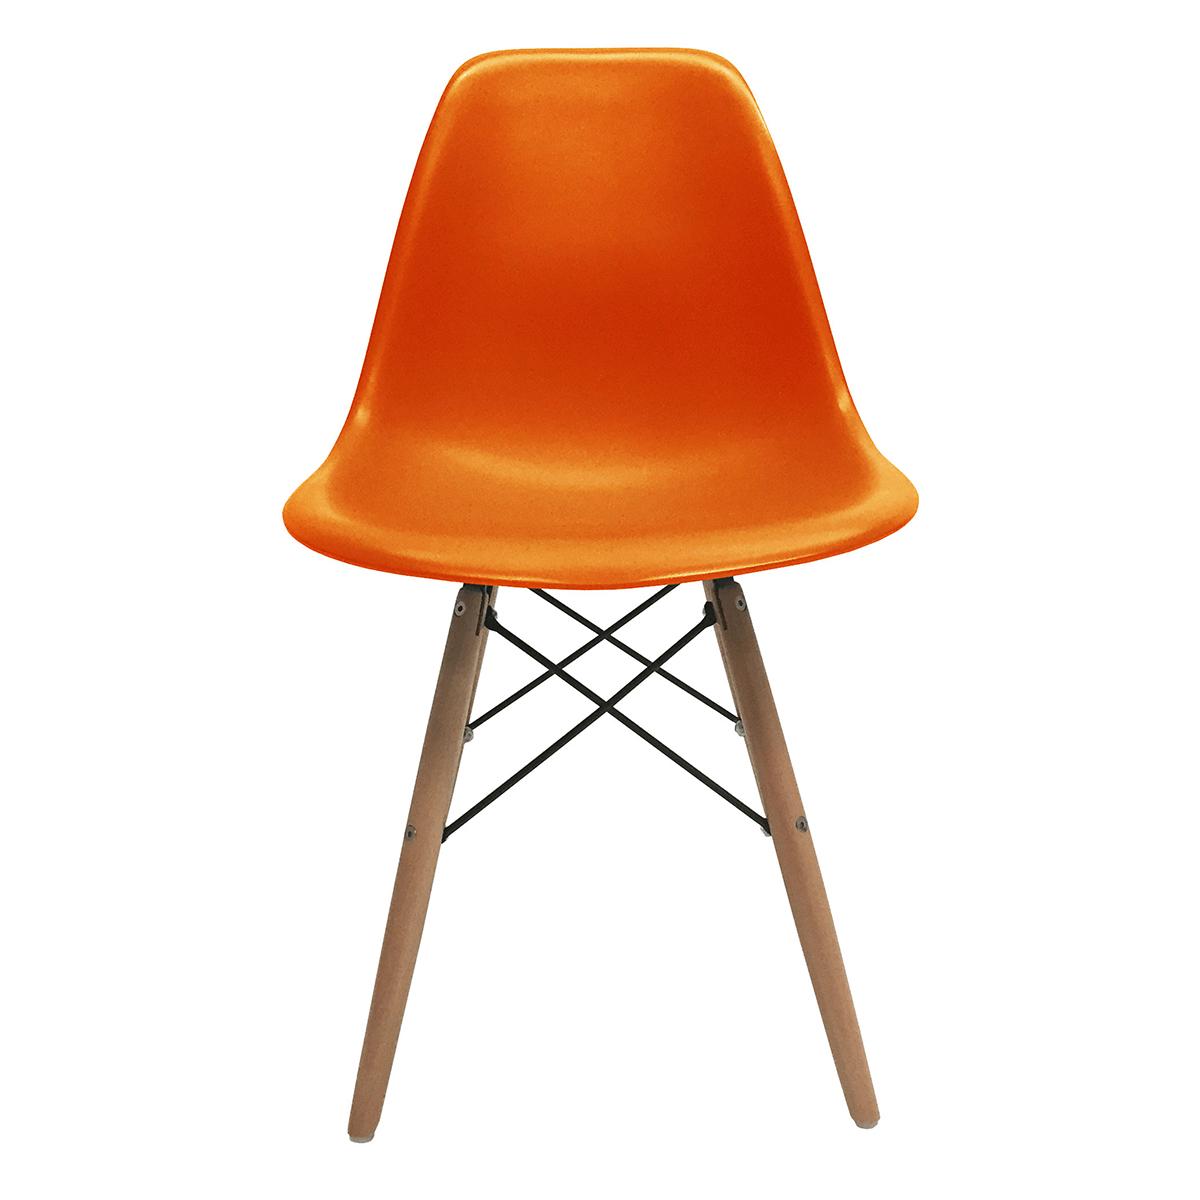 Set of 2 dsw molded side dining chair eiffel dowel leg wood eames style ebay - Eames dsw eiffel chair ...